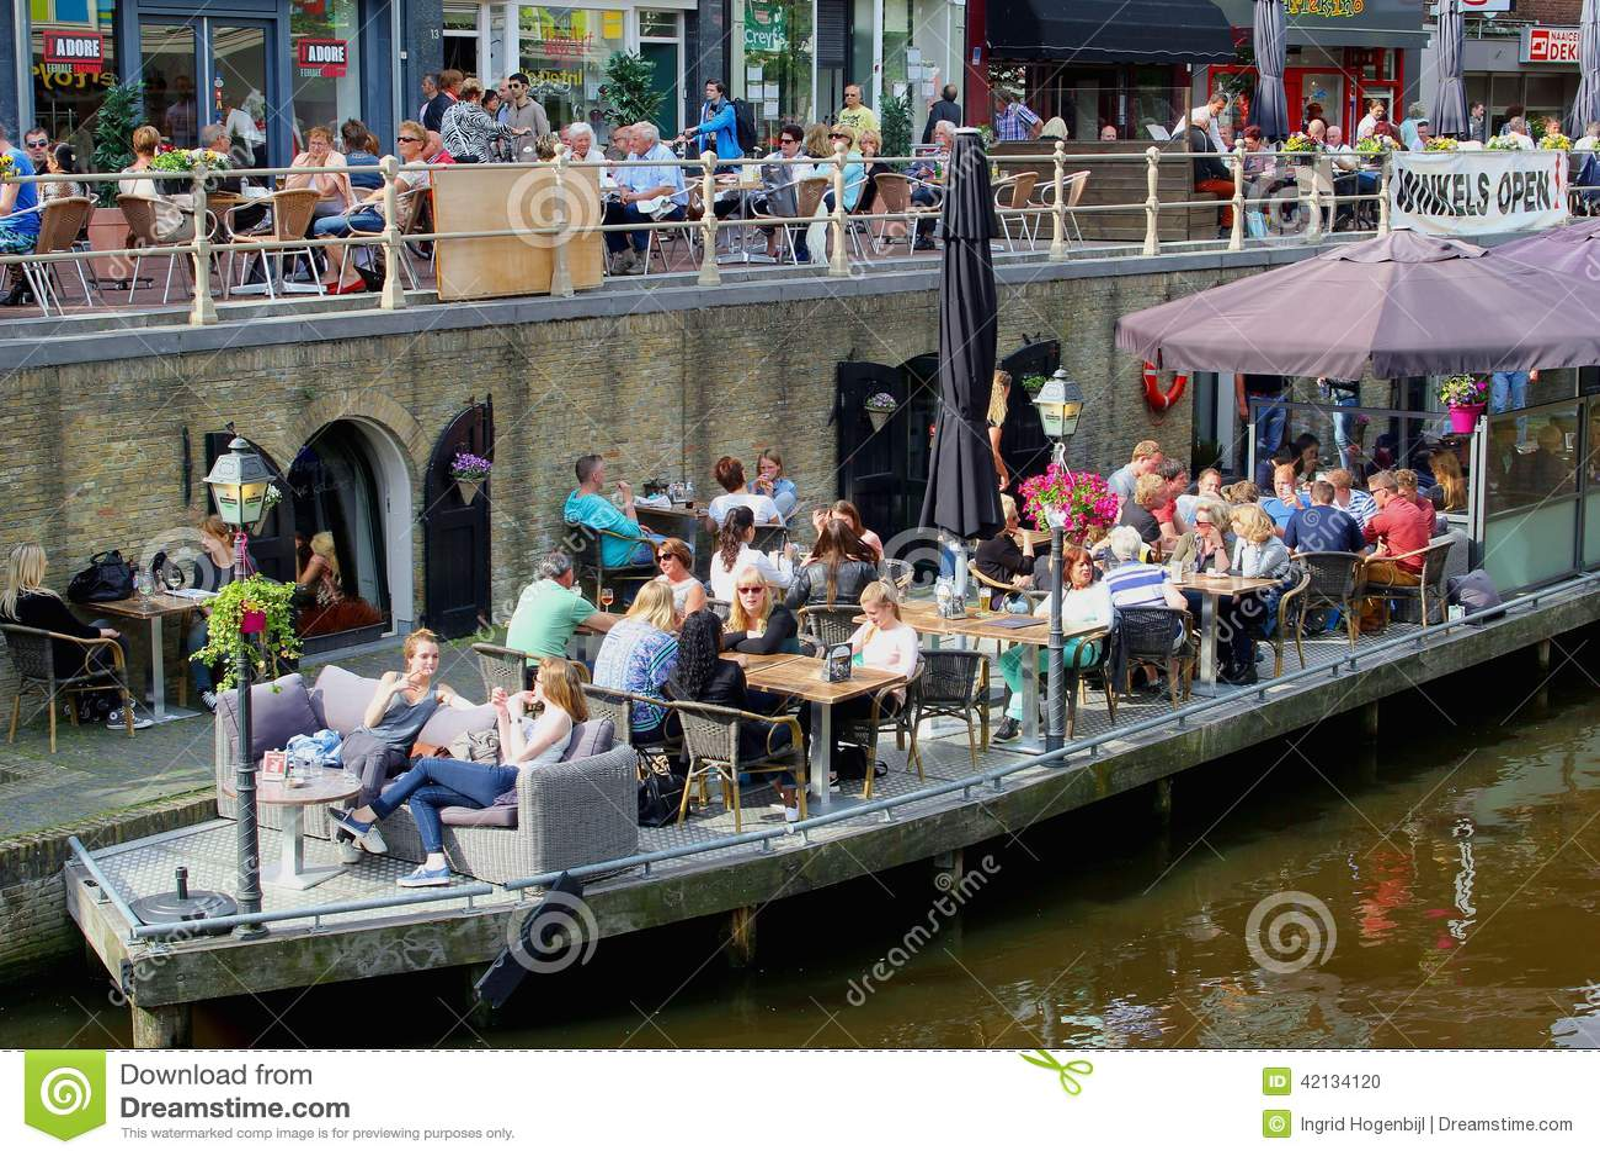 Leeuwarden - DavisHunter.com